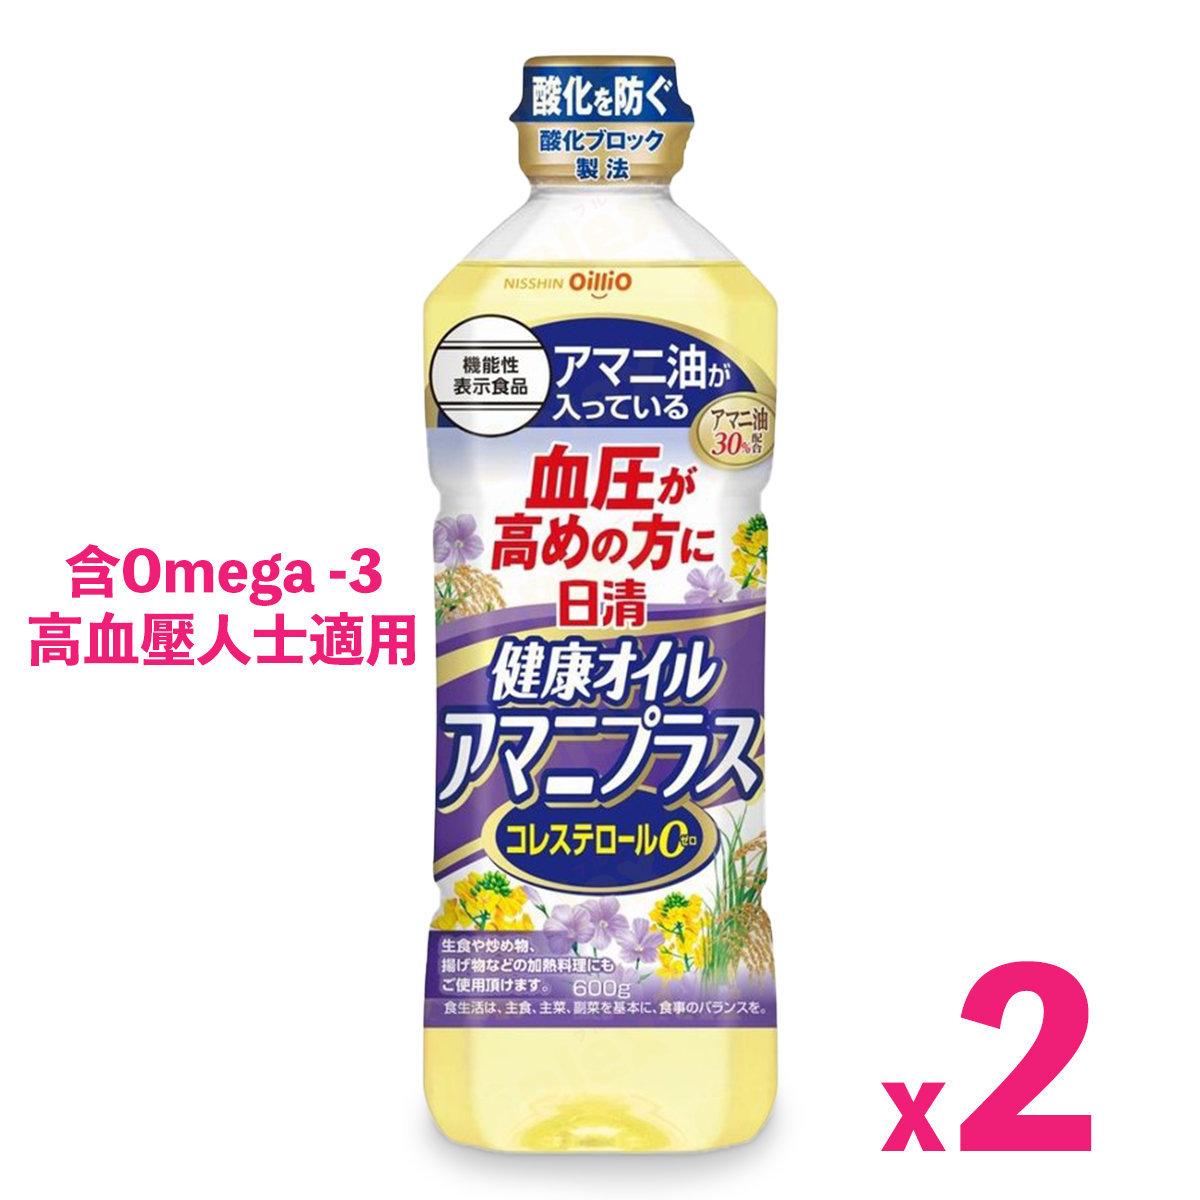 Oilio Healthy Blood Pressure Vegetable Oil (600ml) (Purple) x 2bottles